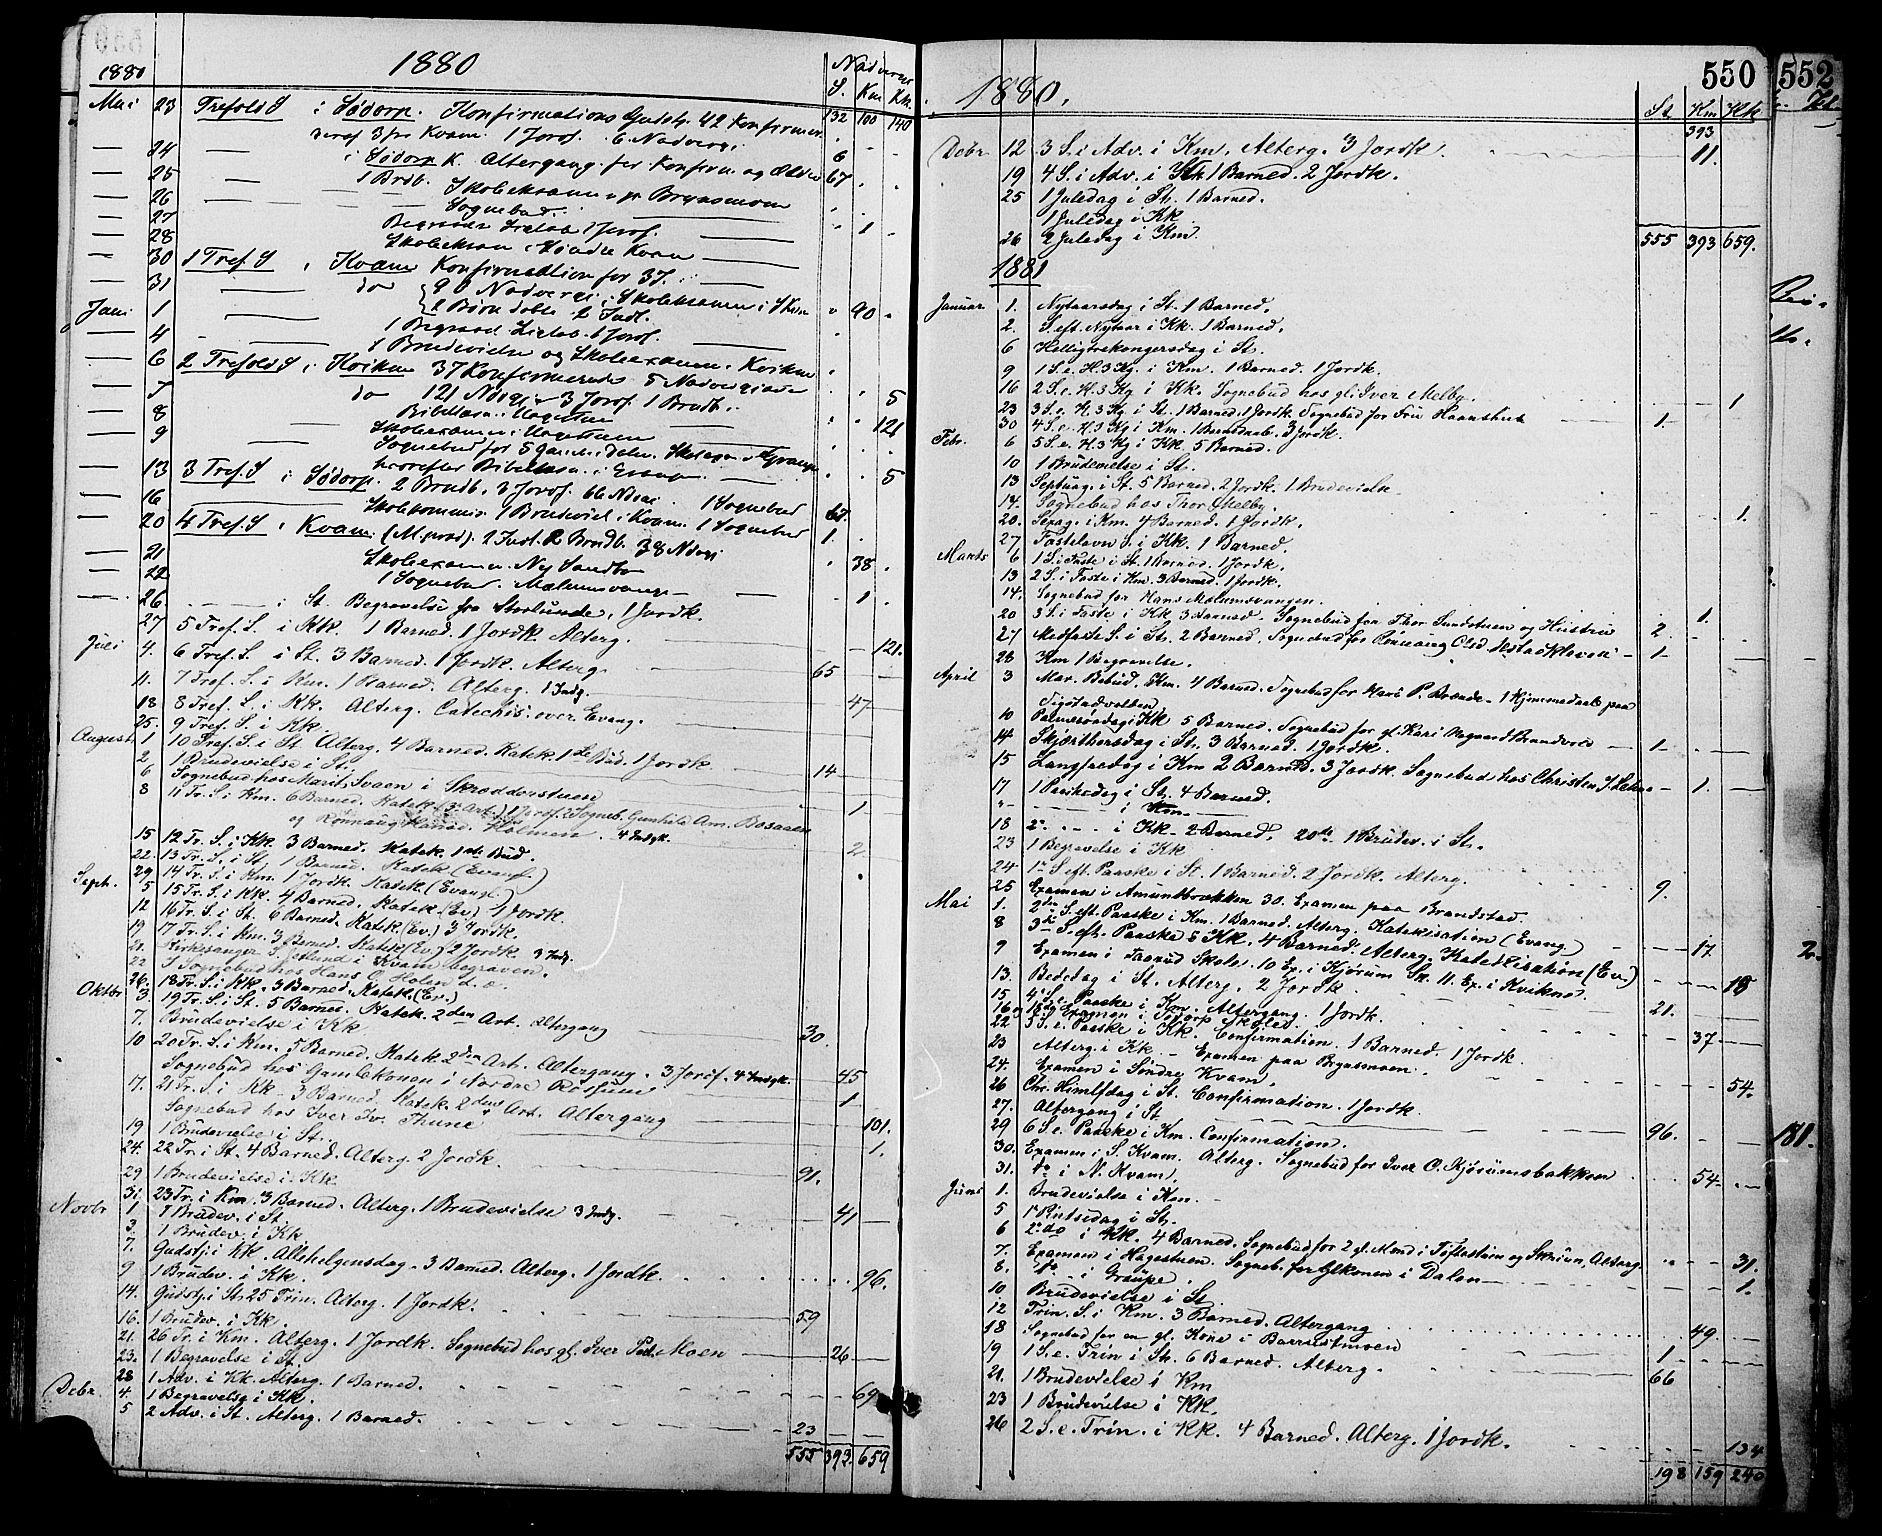 SAH, Nord-Fron prestekontor, Ministerialbok nr. 2, 1865-1883, s. 550